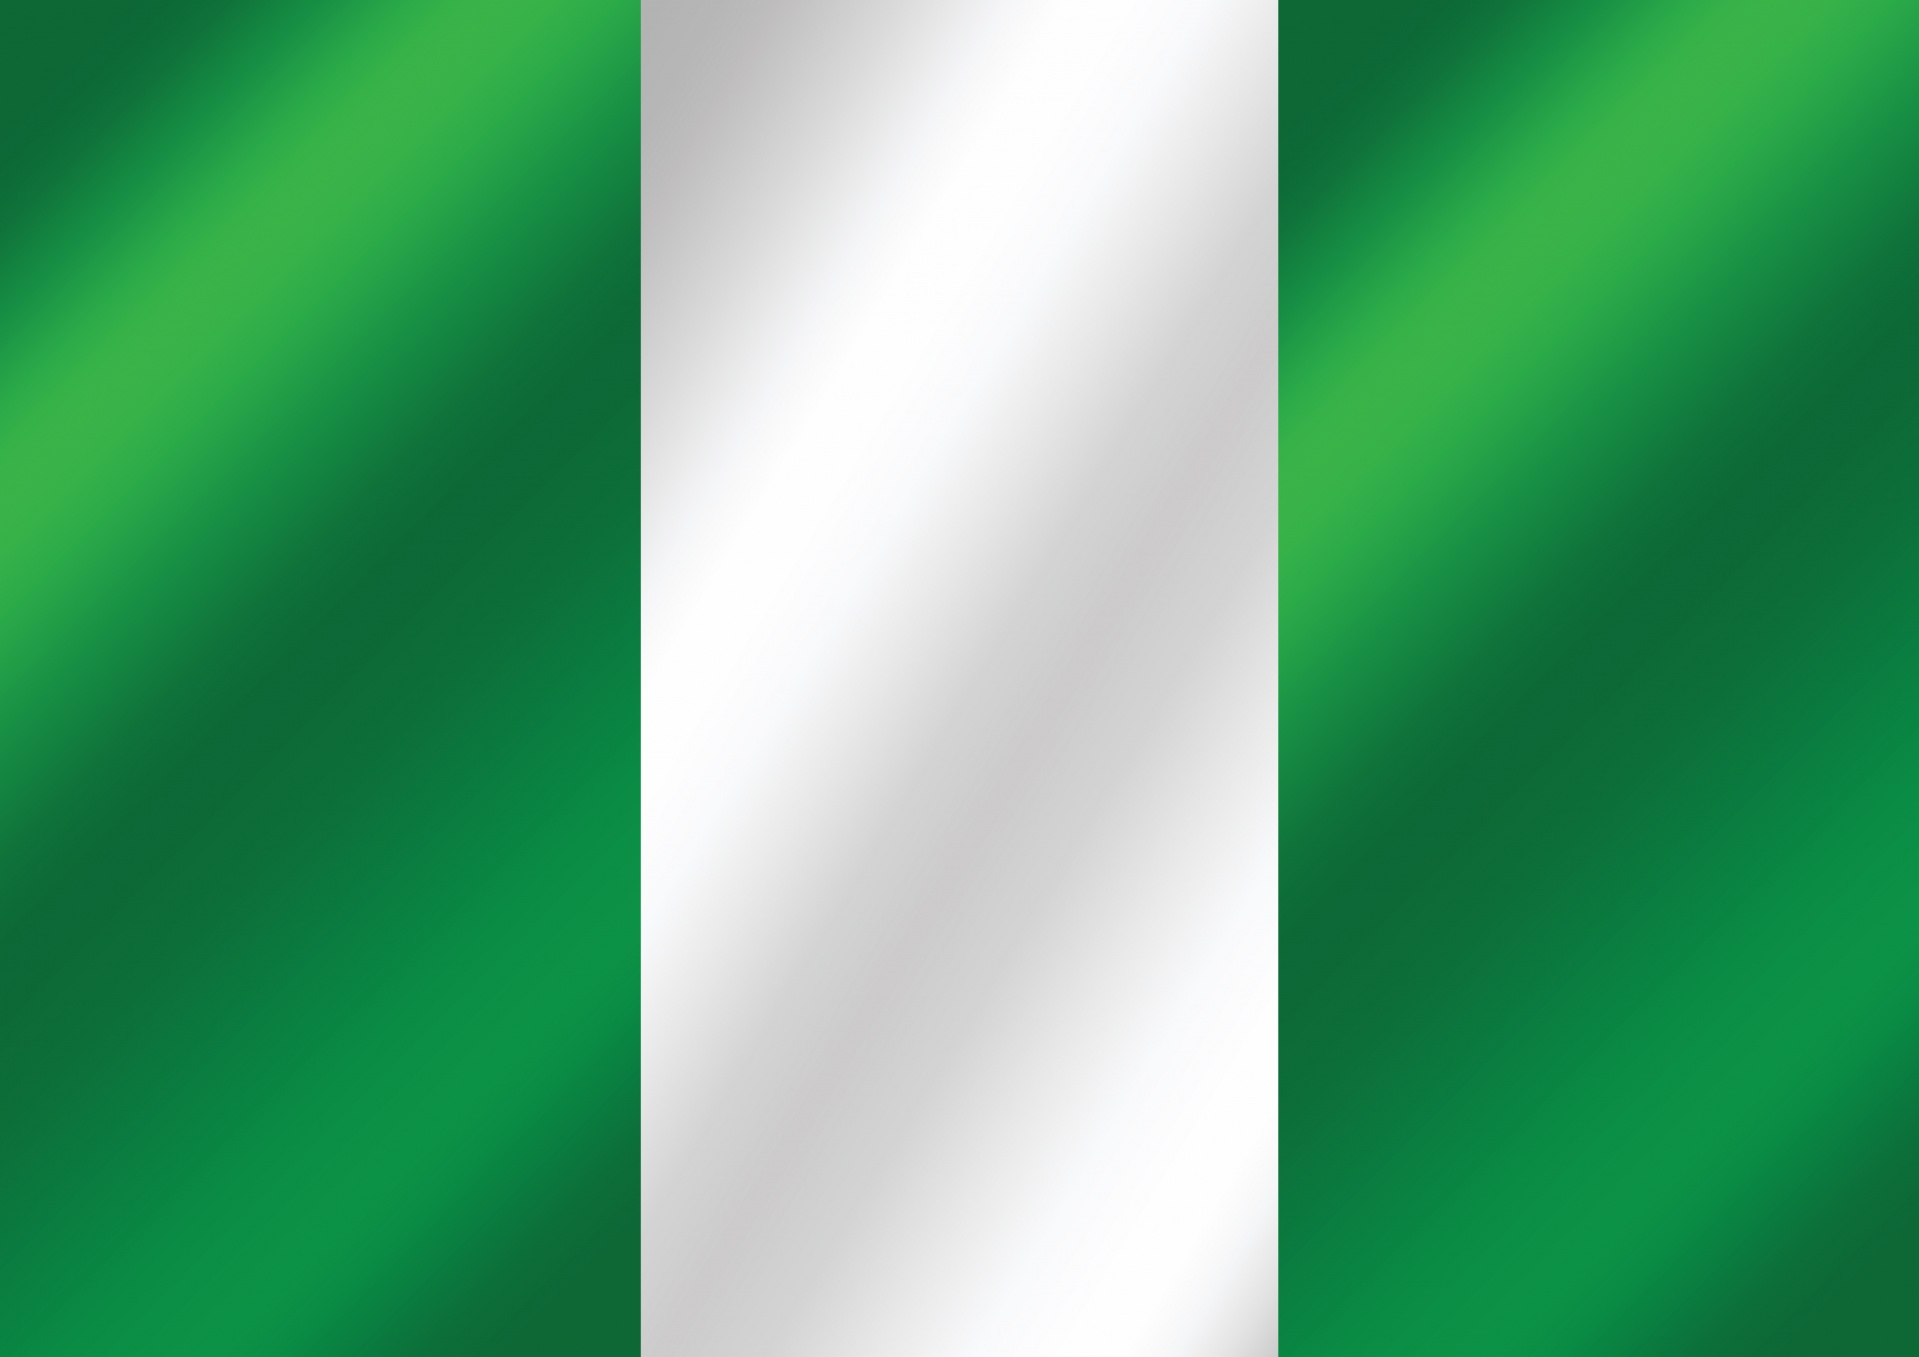 Nigeria Policy on 5G, Wireless and EMFs, Smombie Gate | 5G | EMF